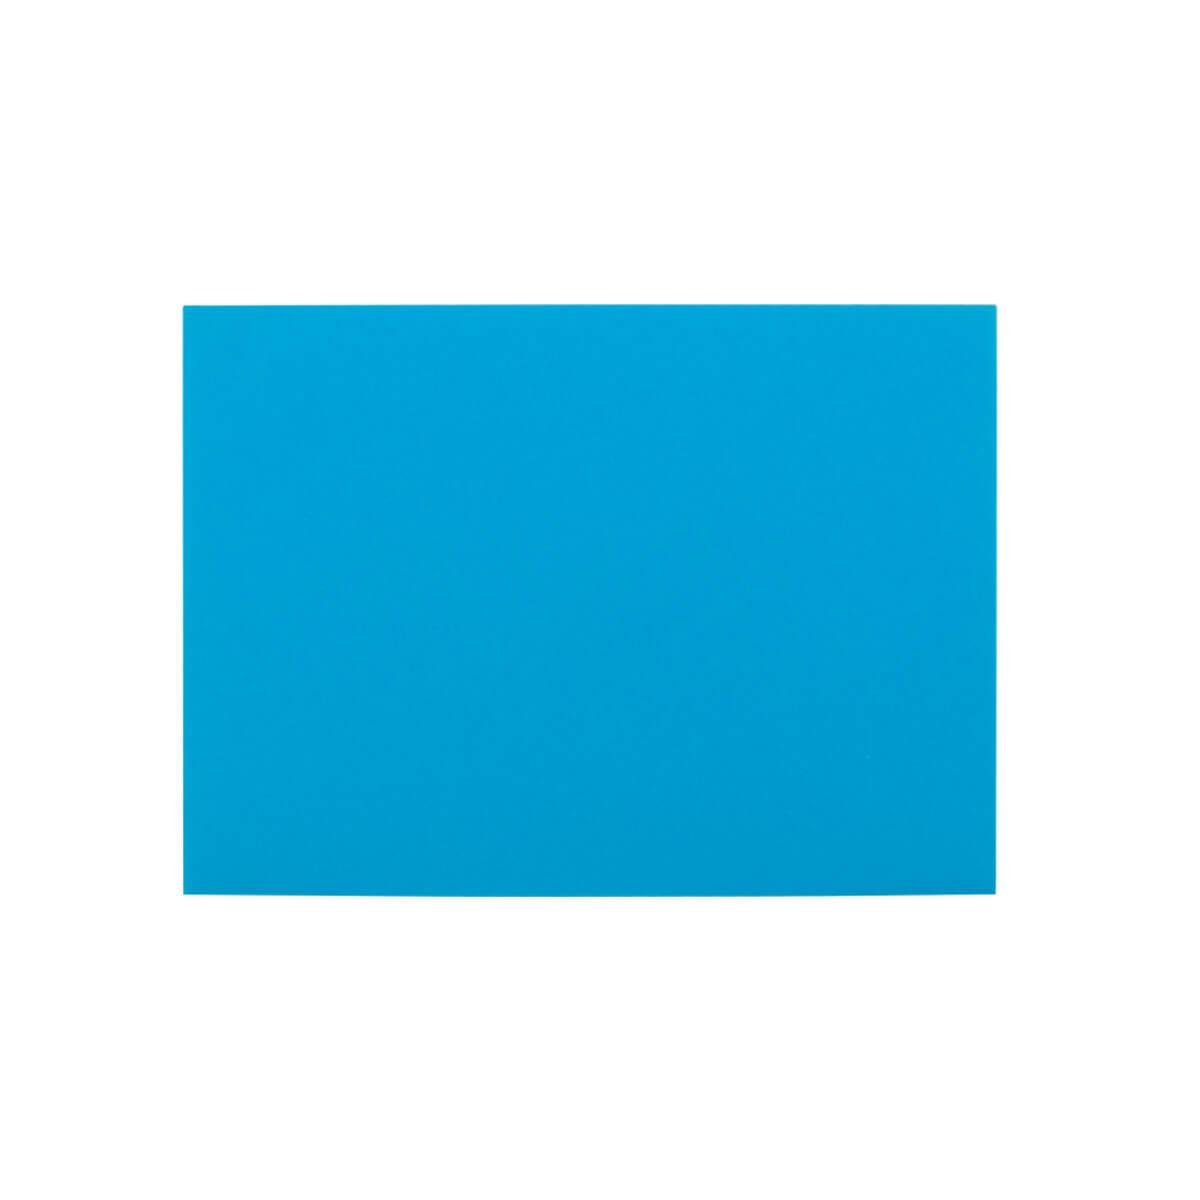 BRIGHT BLUE 133 x 184mm ENVELOPES 120GSM